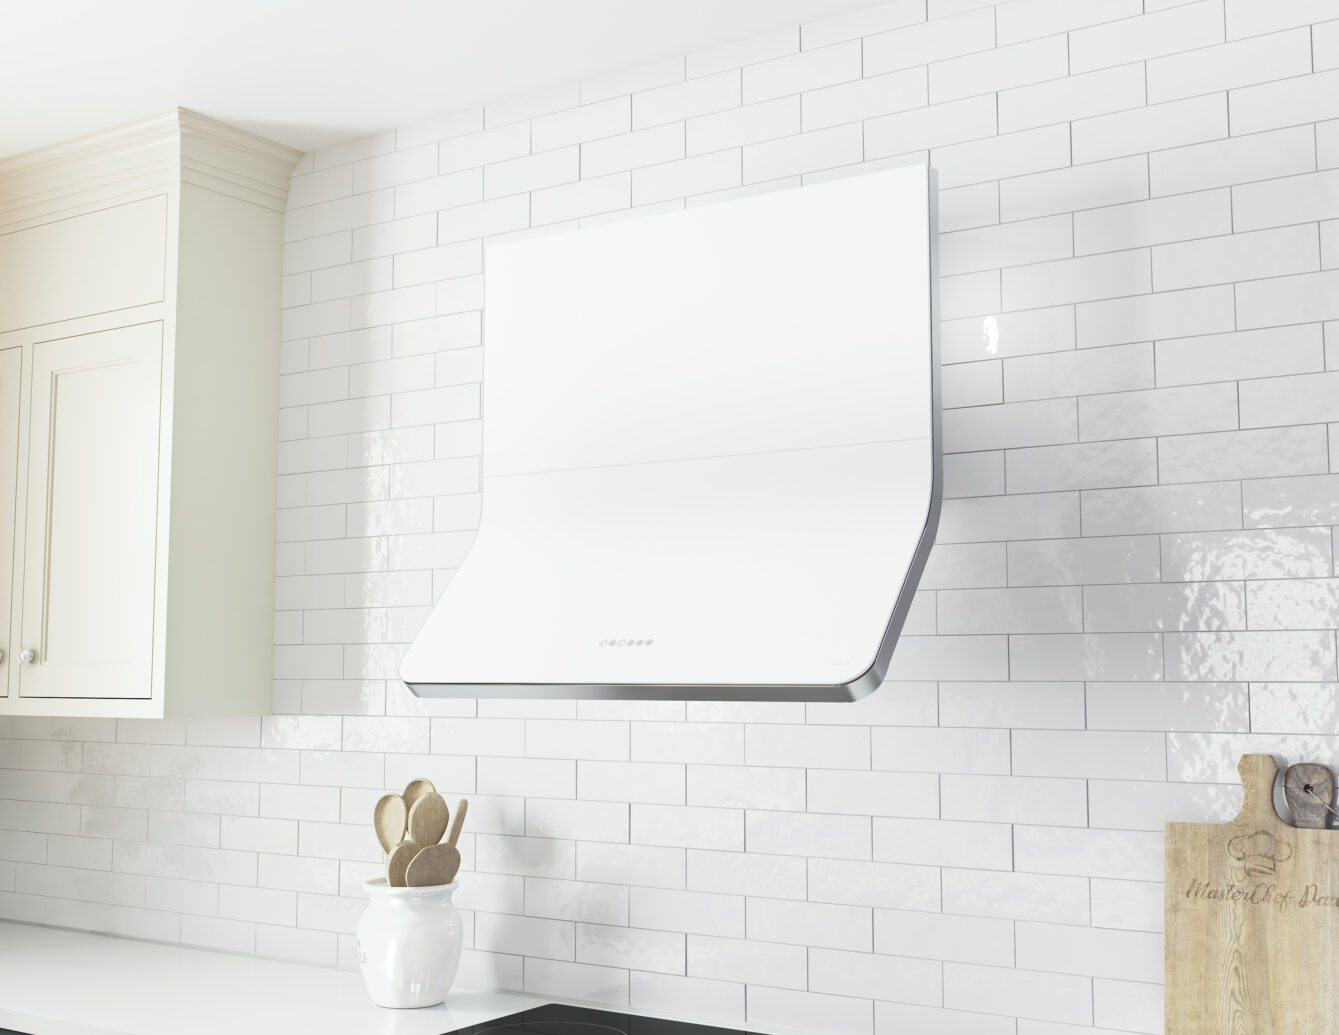 DHZ-A Zephyr Horizon Wall Range Hood in matte white glass